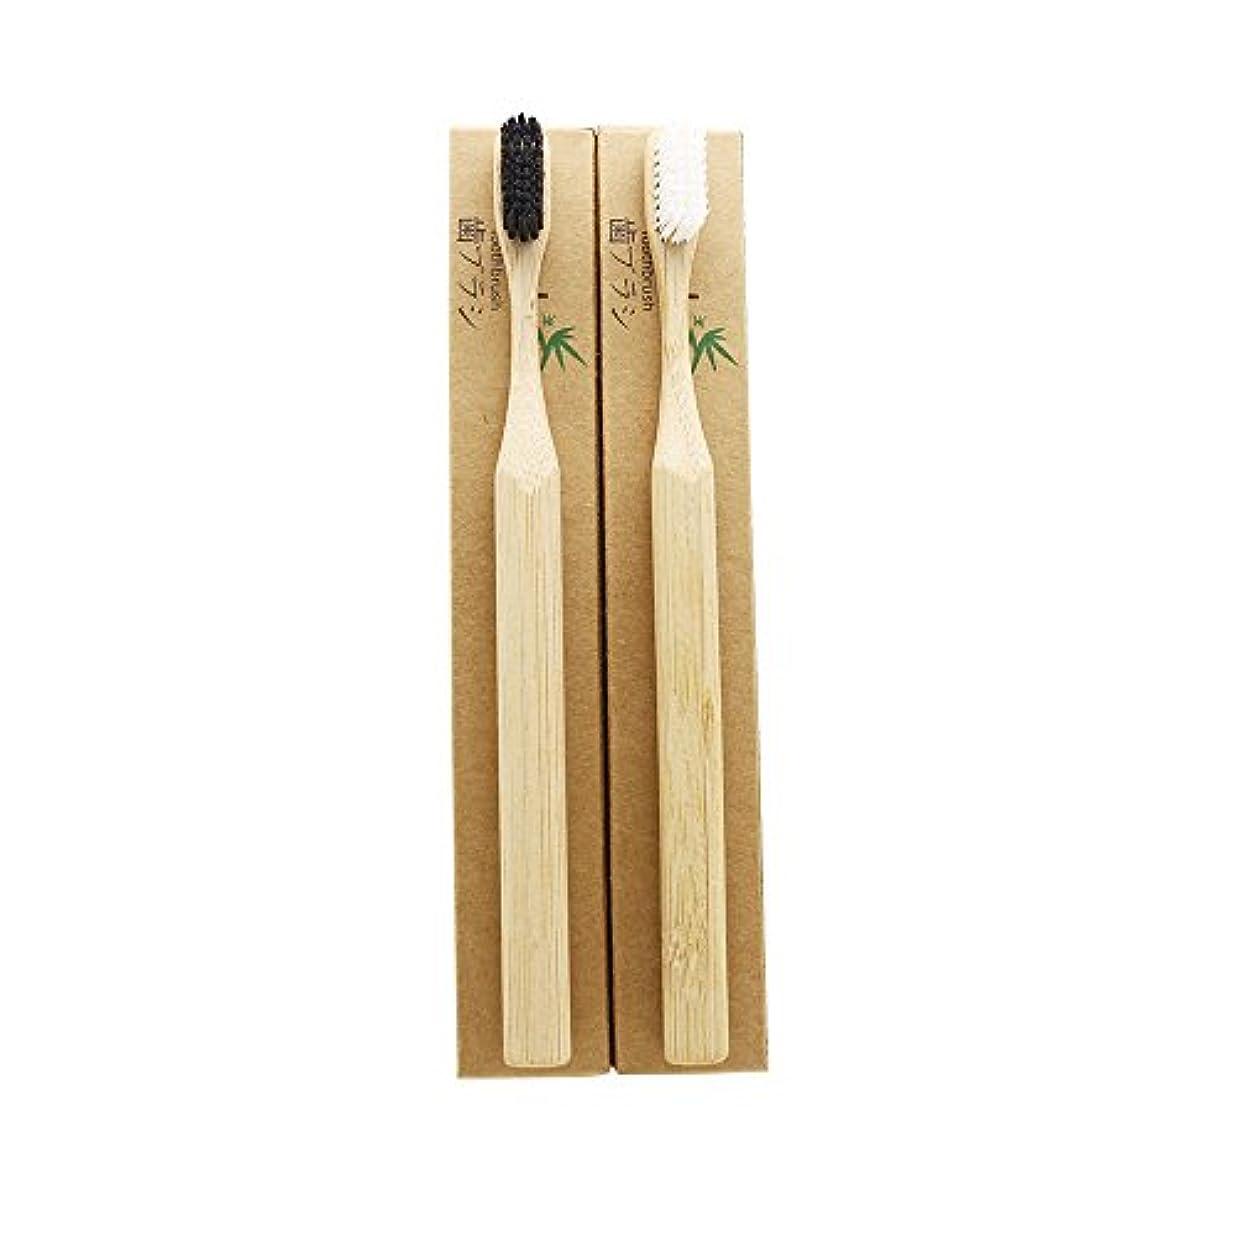 N-amboo 竹製 歯ブラシ 高耐久性 白と黒 セット エコ 丸いハンドル (2本)